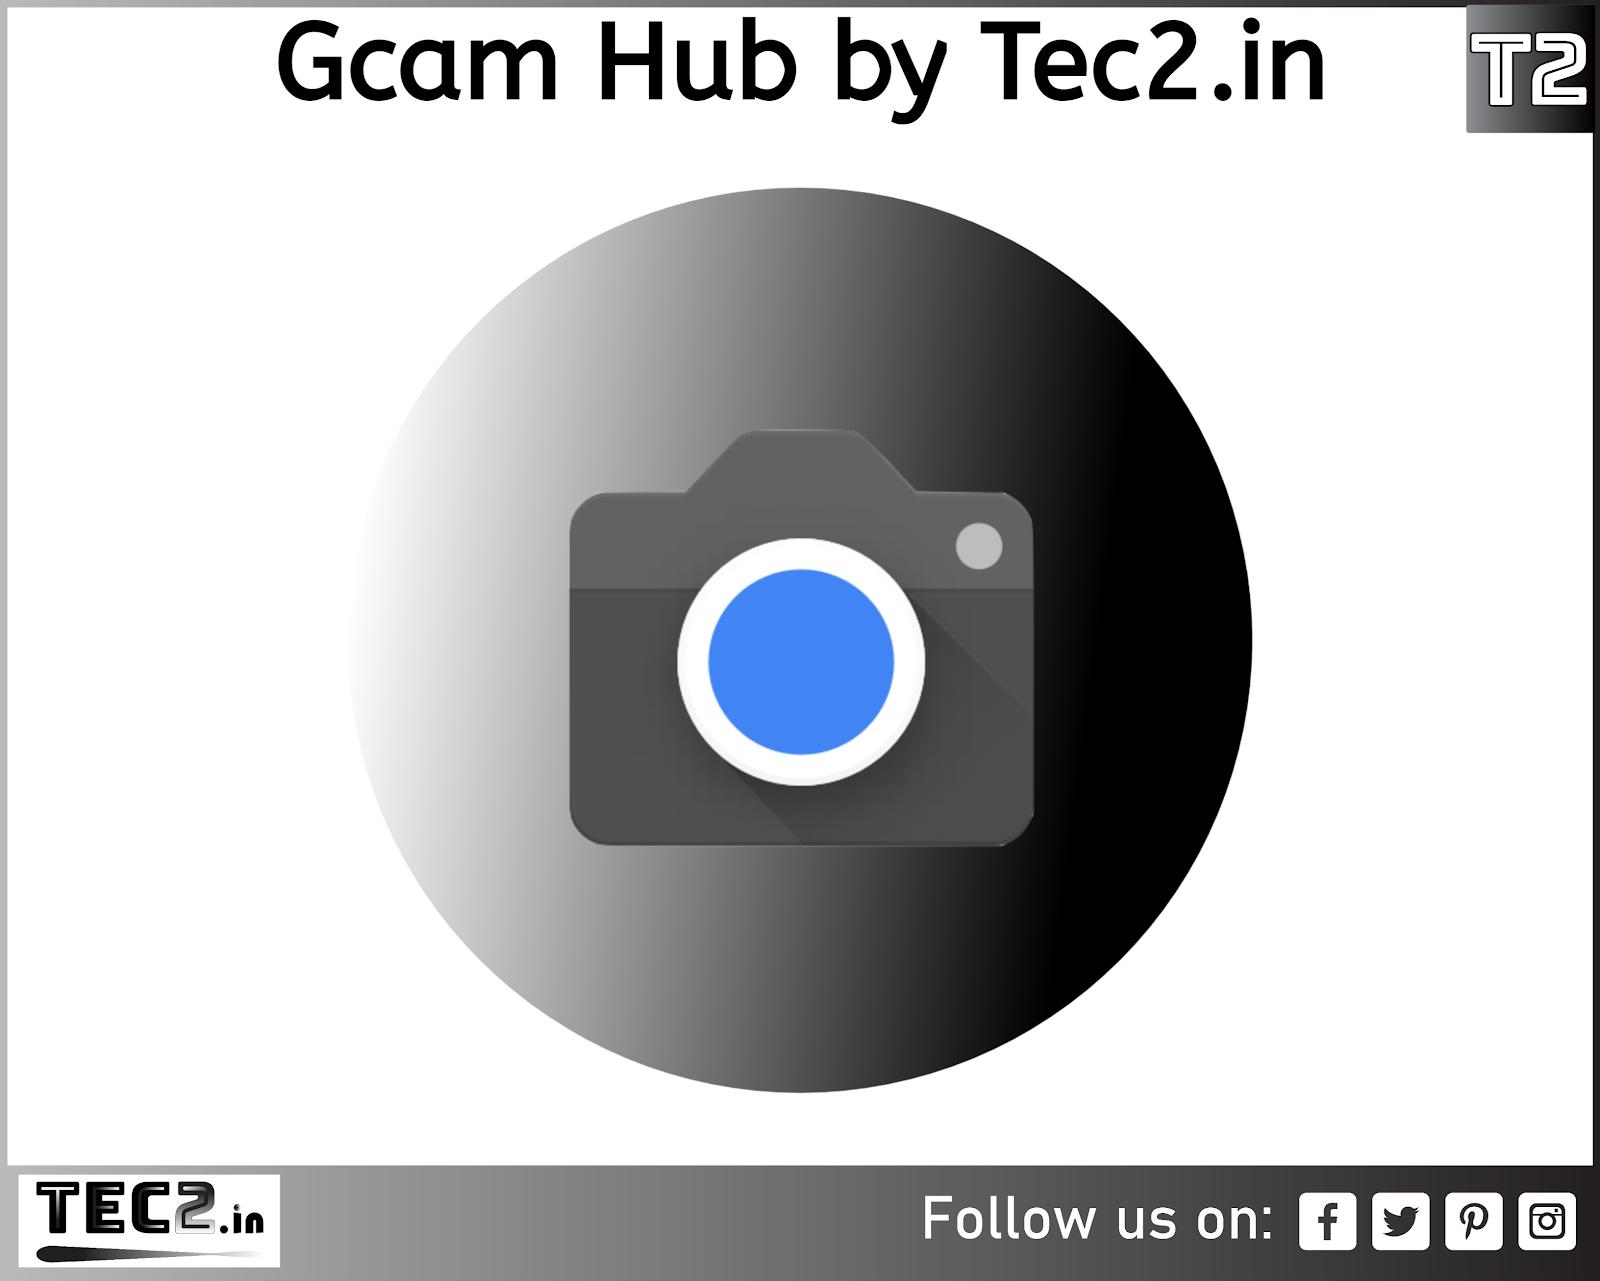 GCAM Hub